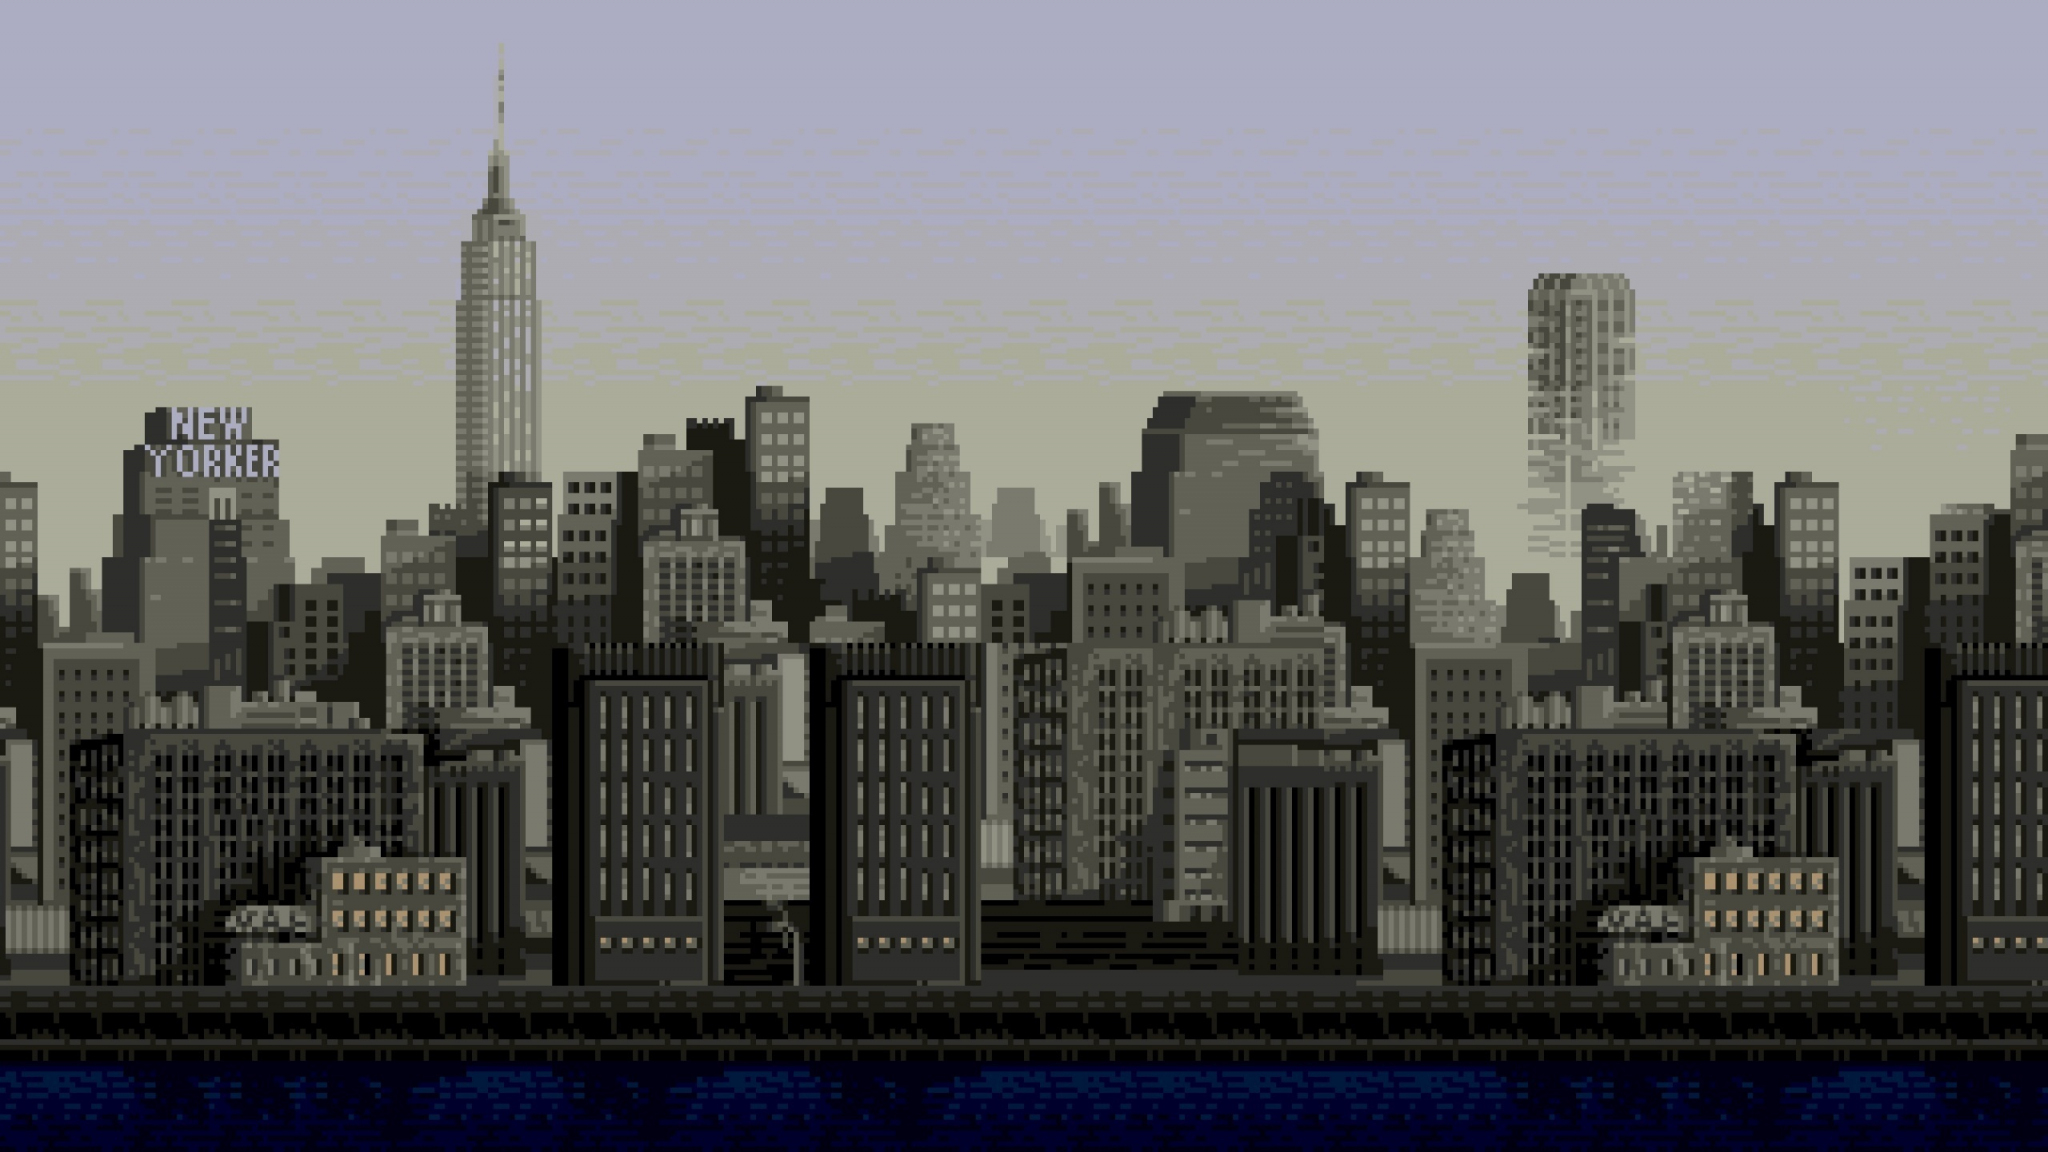 Download 2048x1152 Wallpaper Pixel Art Cityscape Buildings